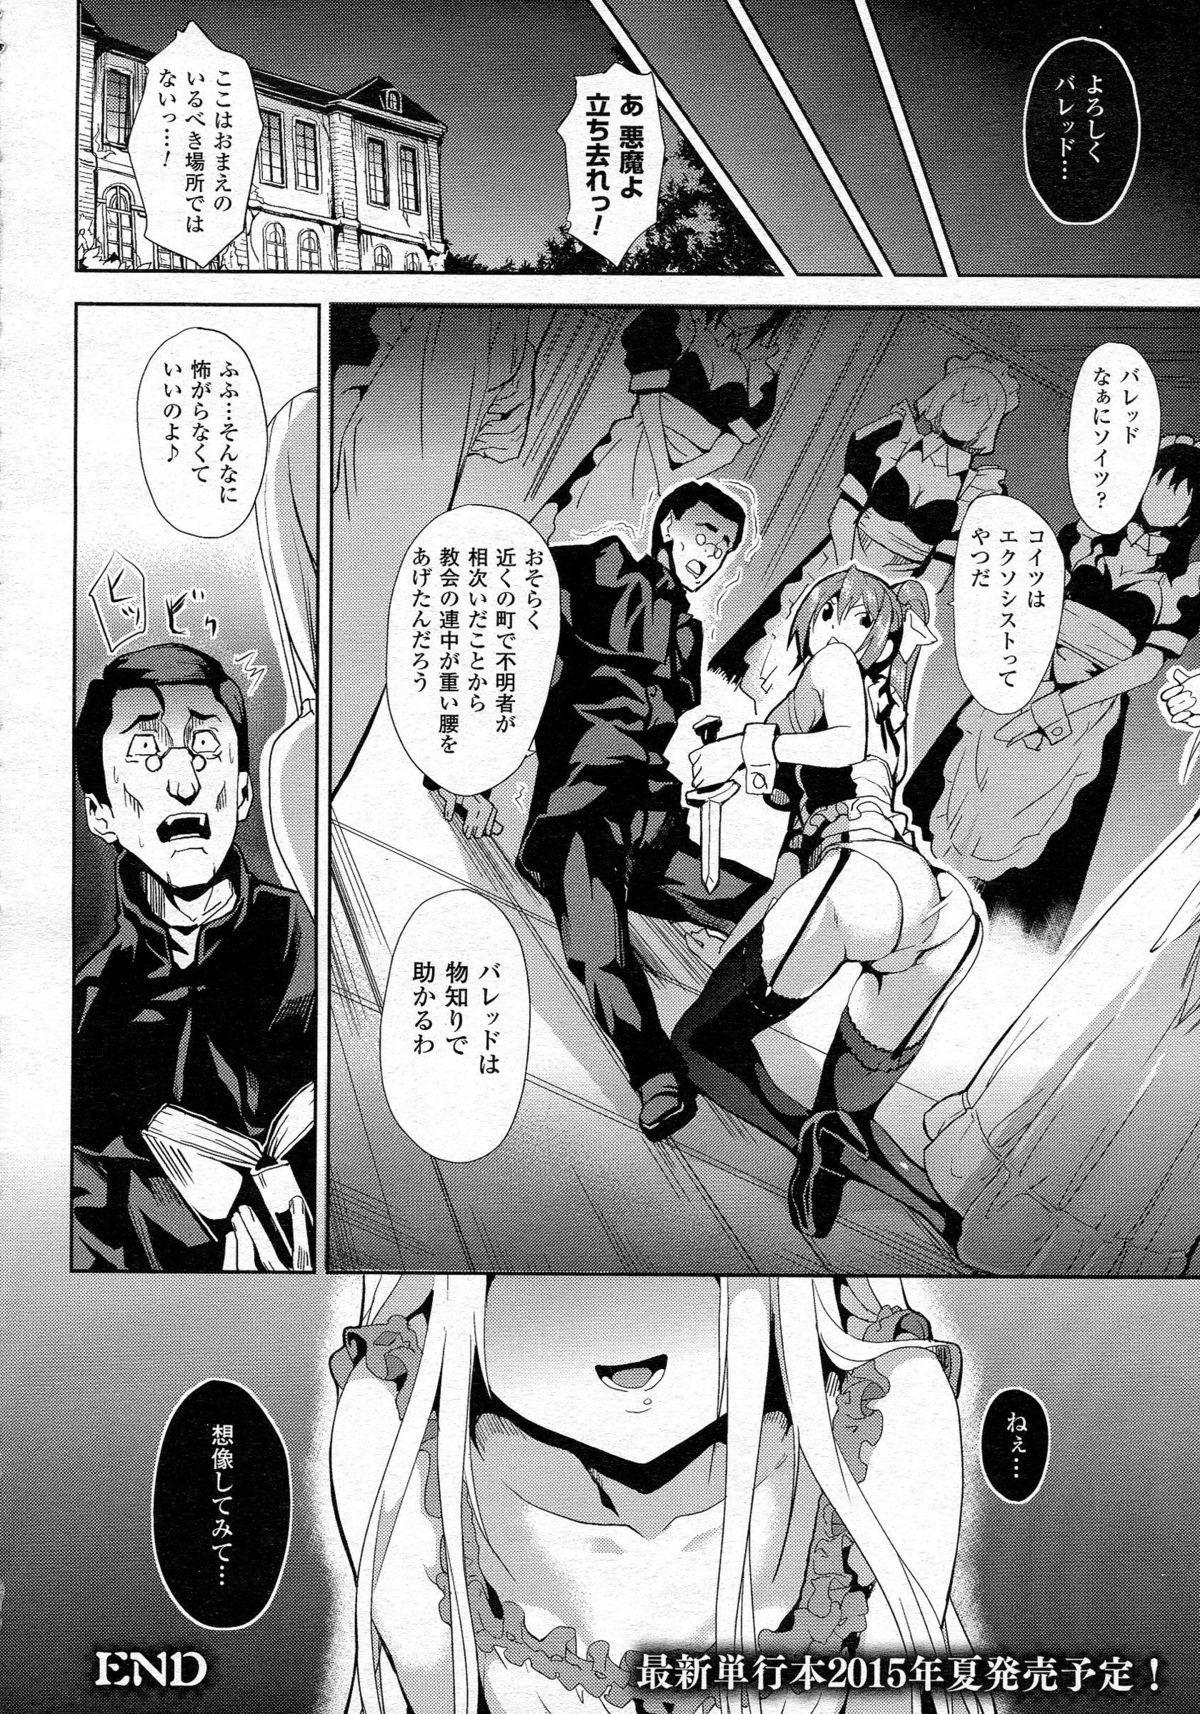 COMIC Unreal 2015-06 Vol. 55 + Hisasi Illust Shuu 86